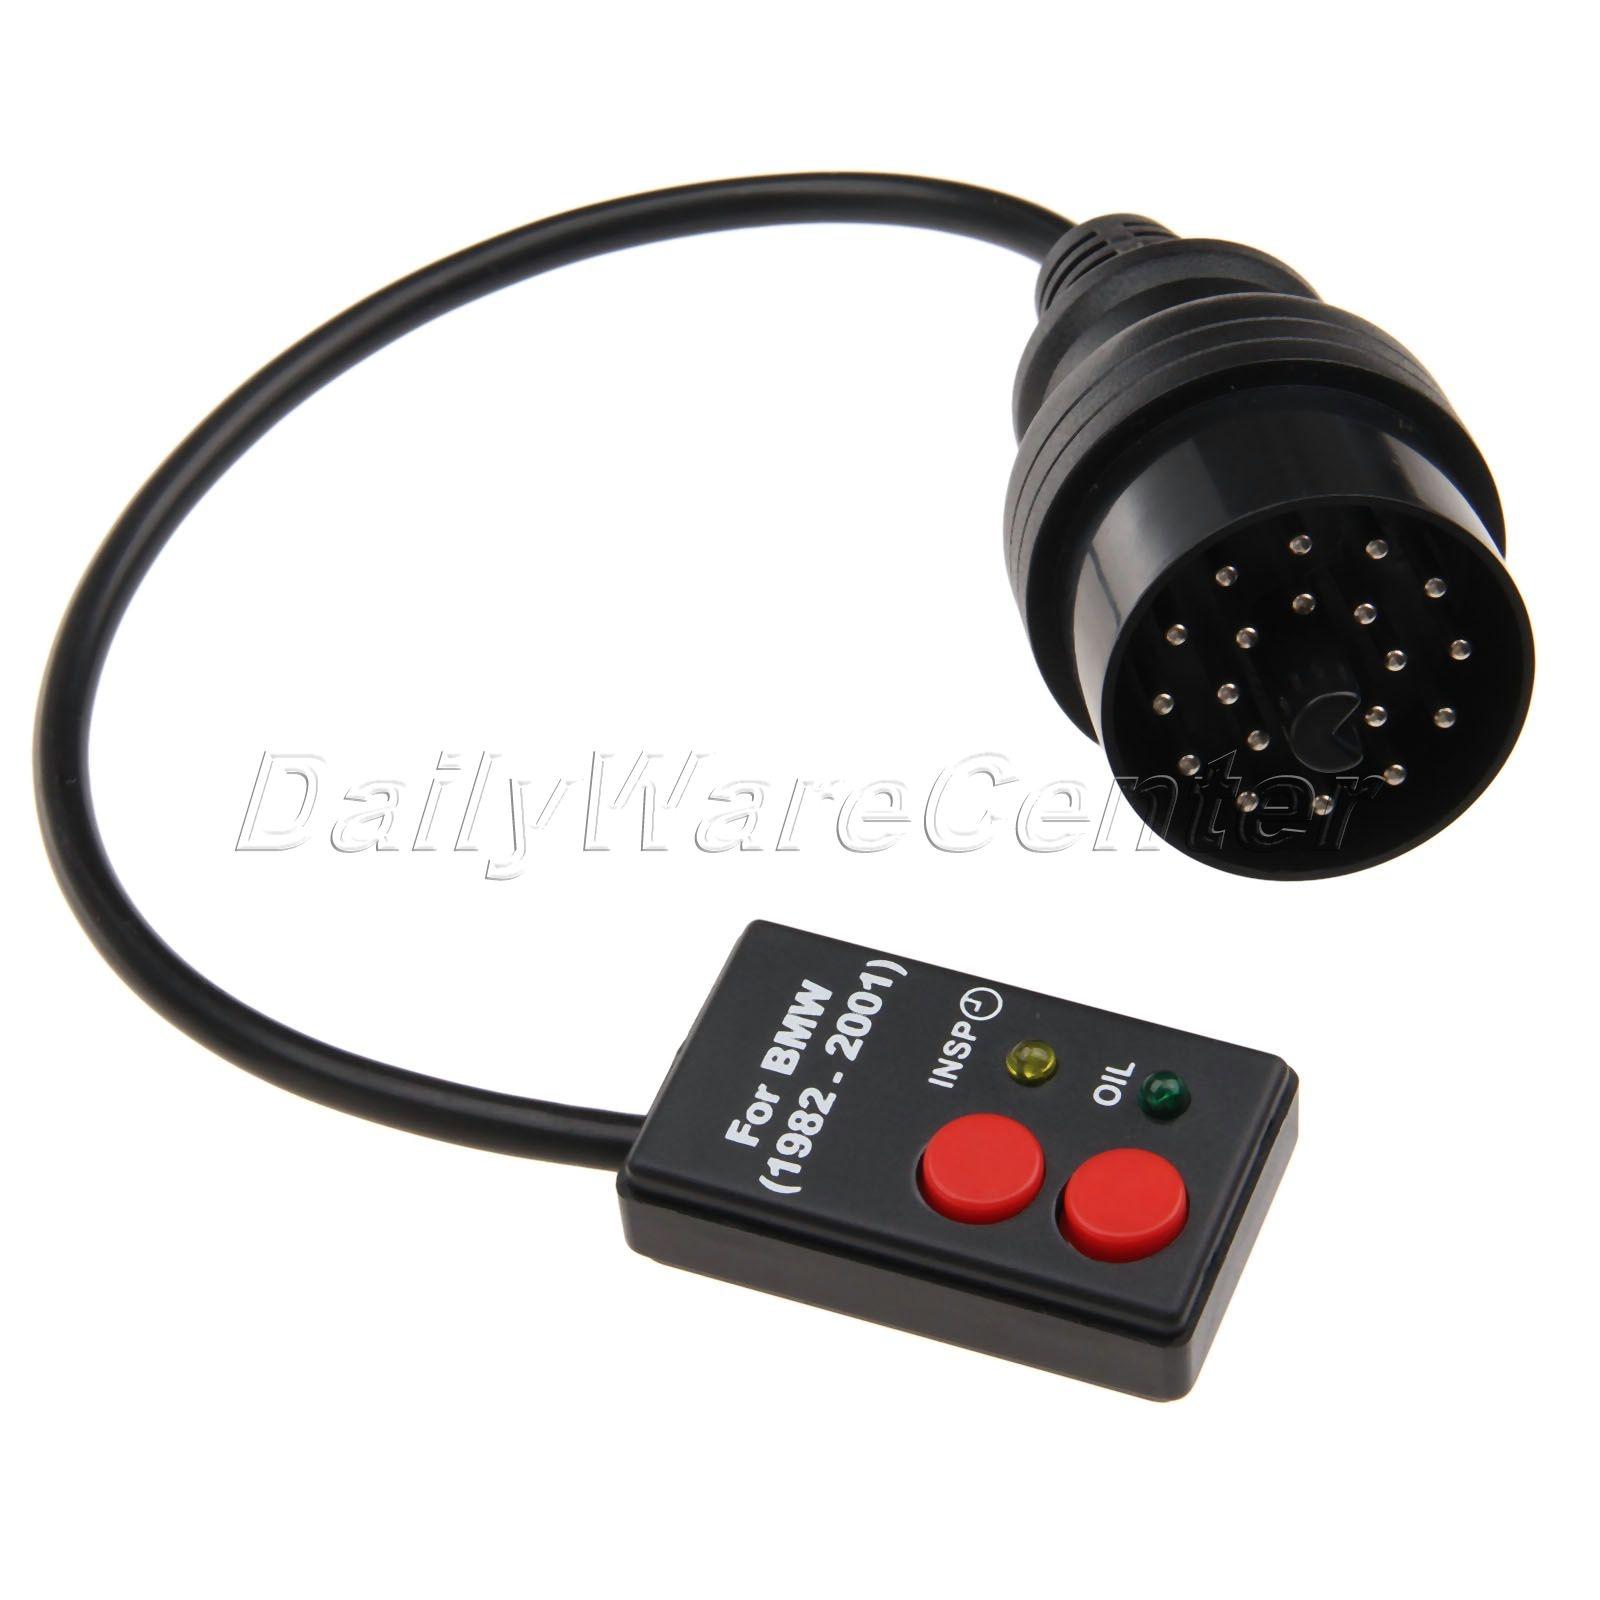 auto-car-20-pin-led-sockets-oil-service-reset-diagnostic-tool-for-bmw-e30-e34-e36-e38-e39-3-fontb5-b